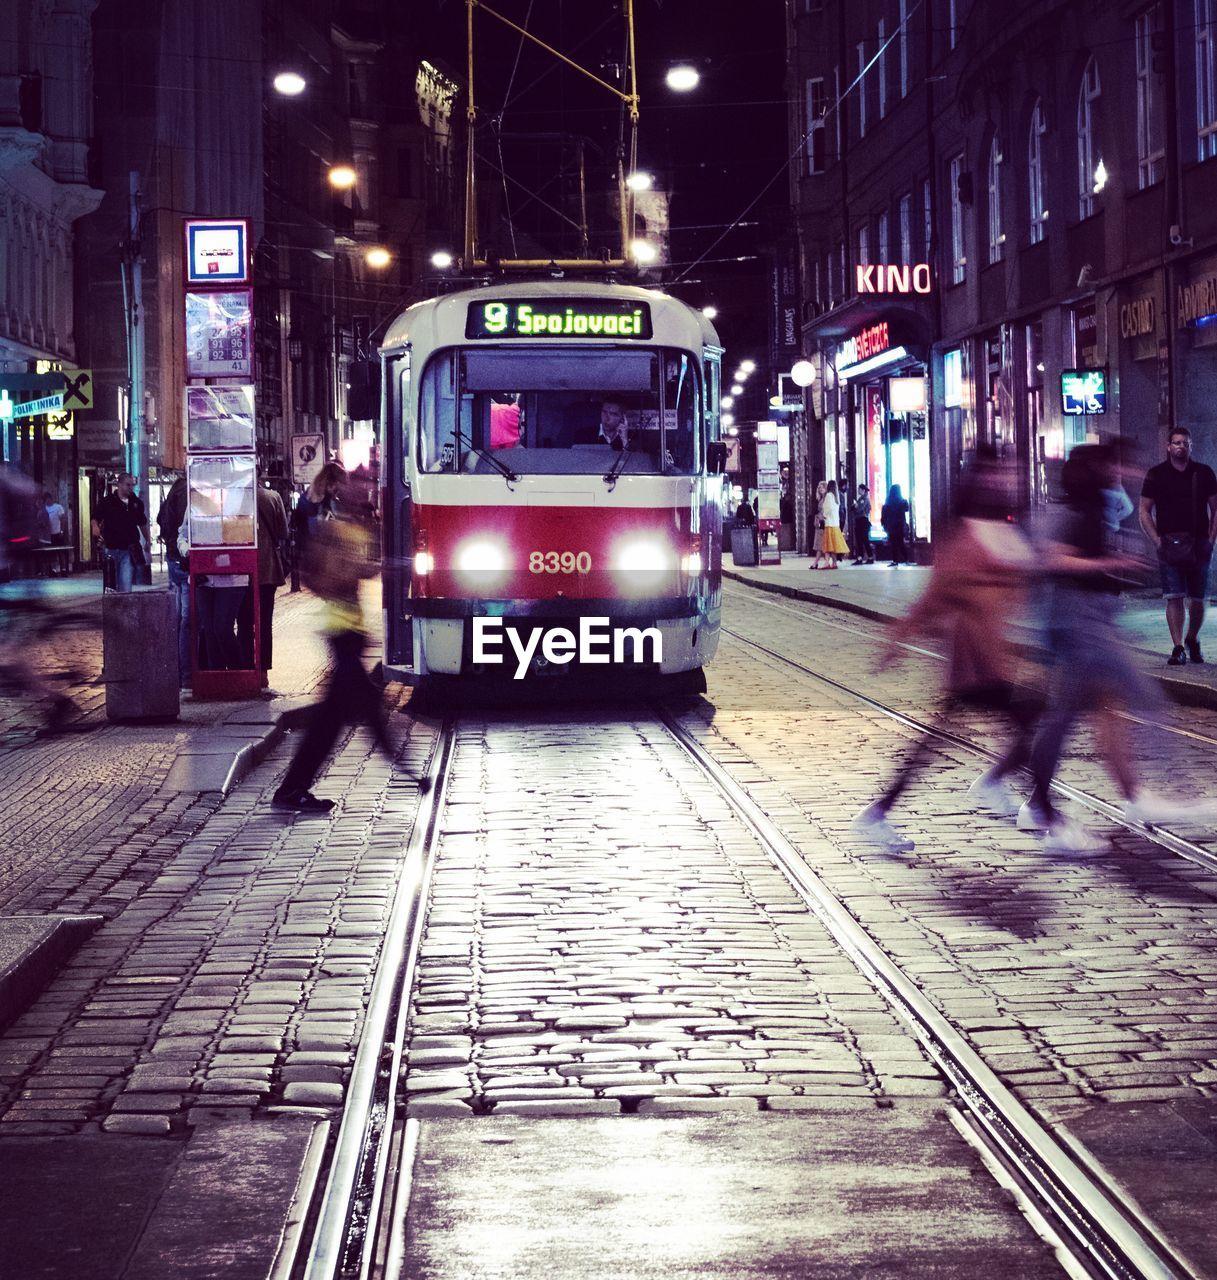 CARS MOVING ON ILLUMINATED STREET AT NIGHT